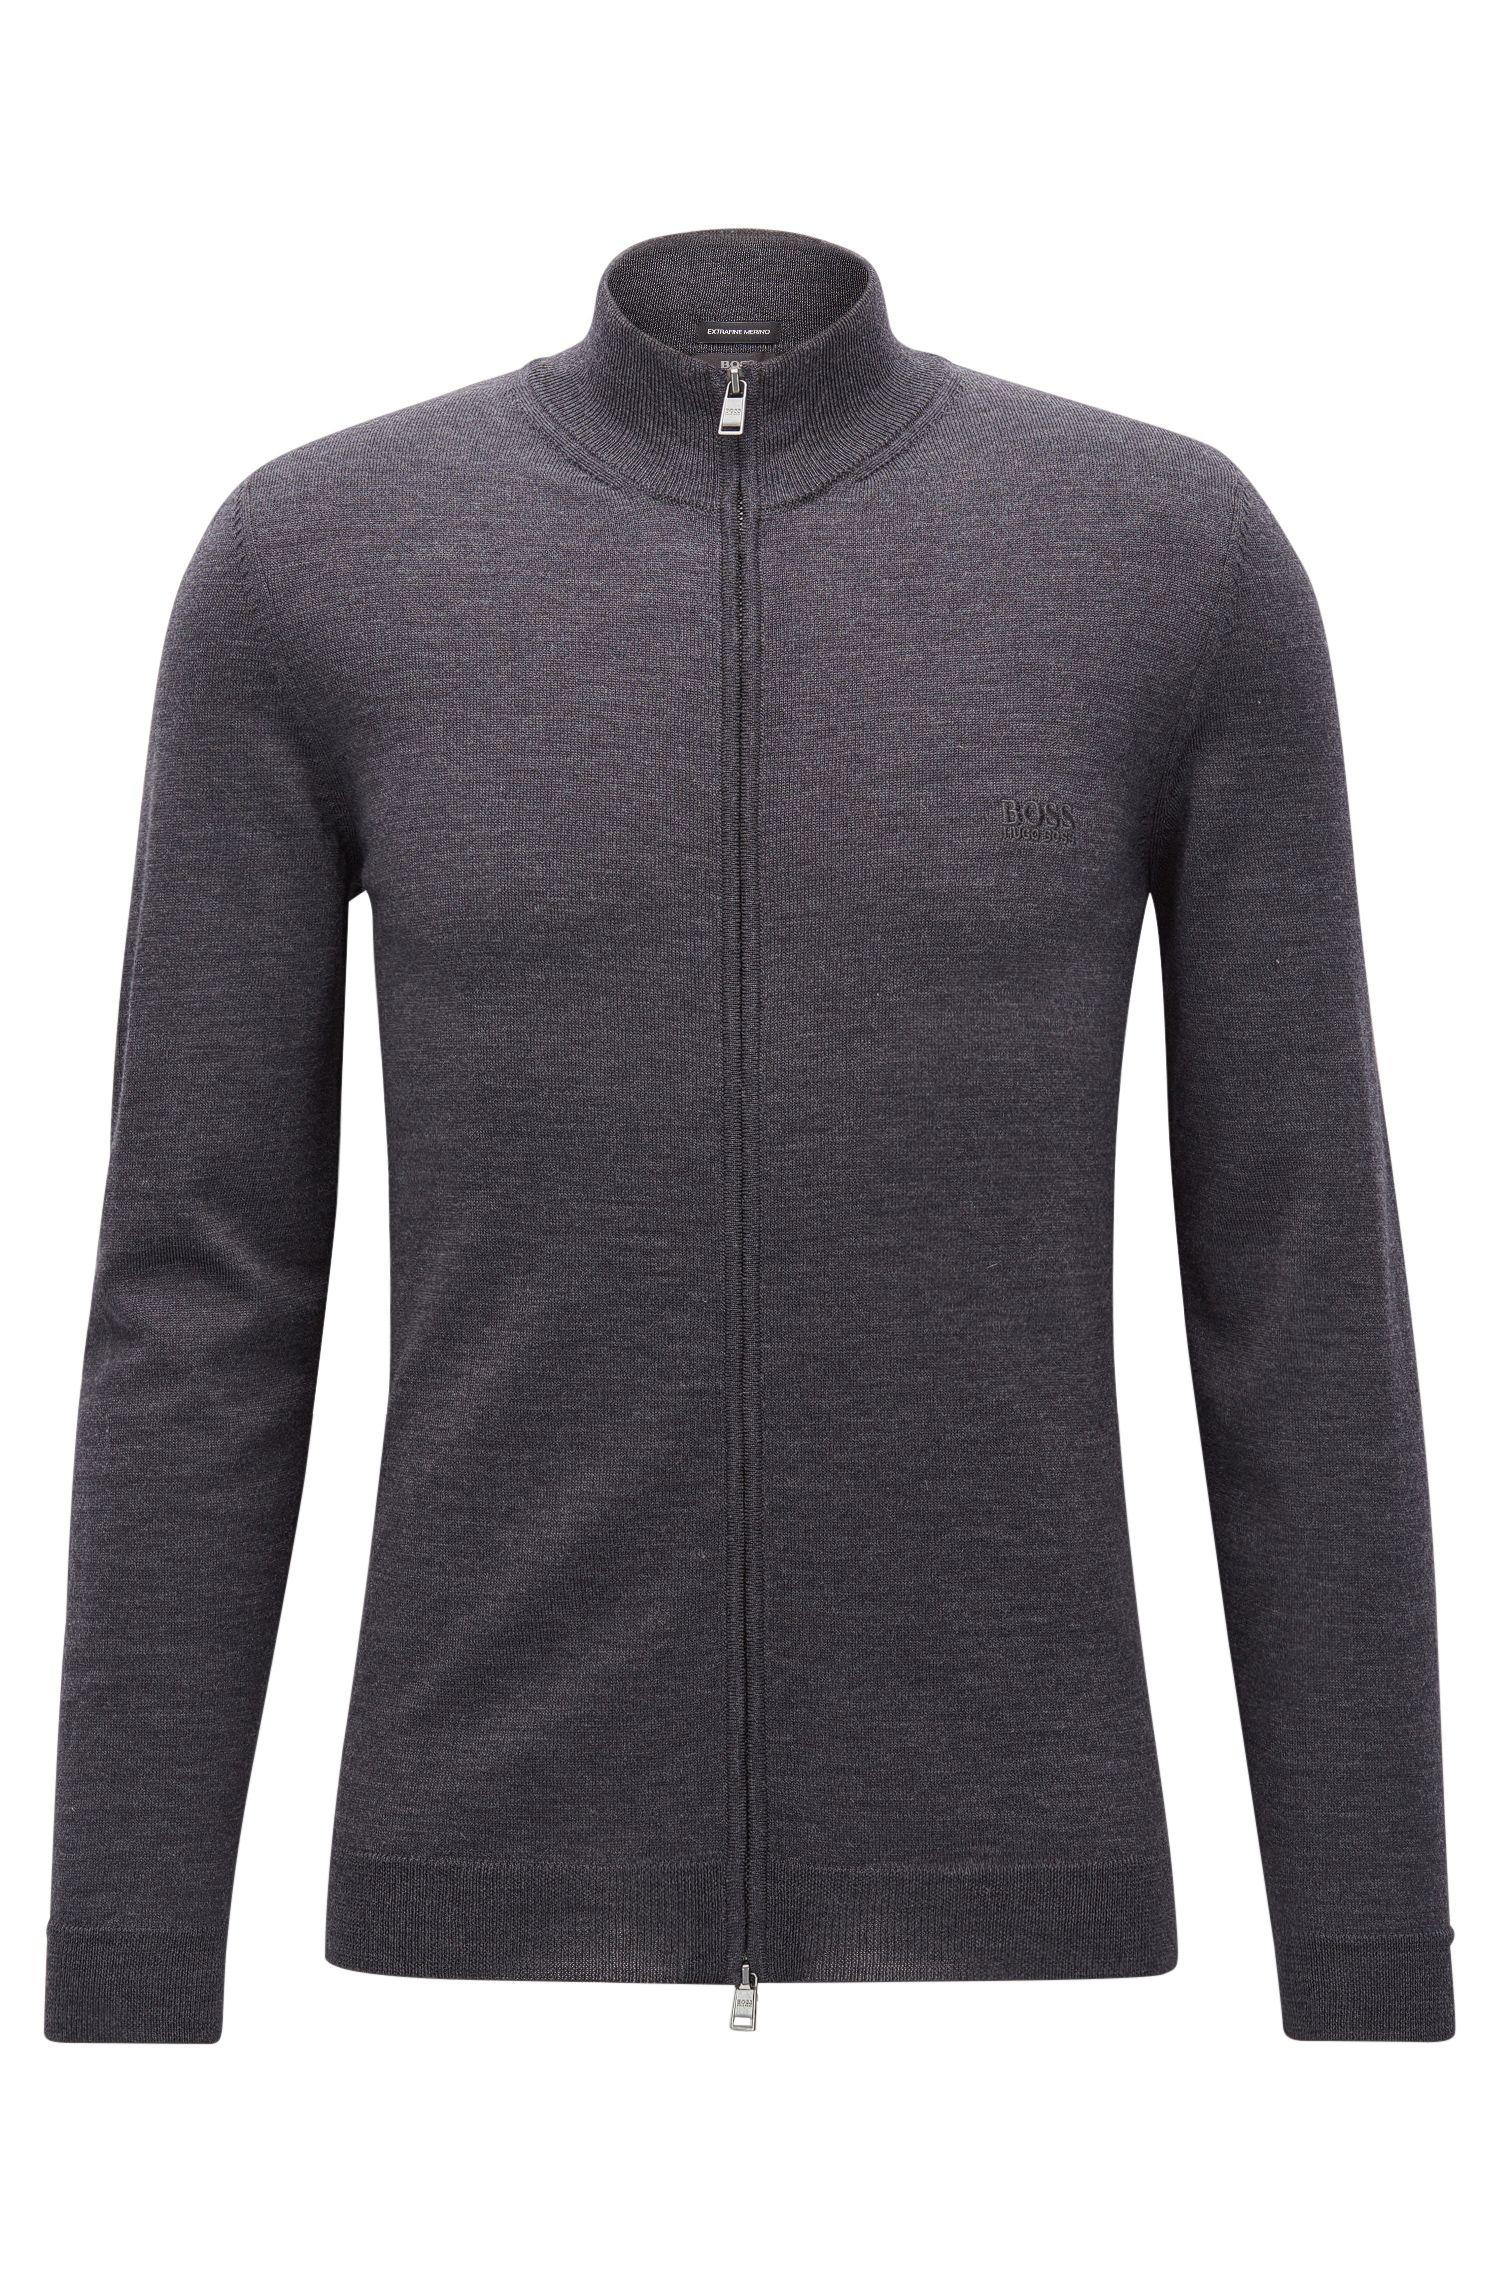 Cardigan con zip integrale in lana vergine